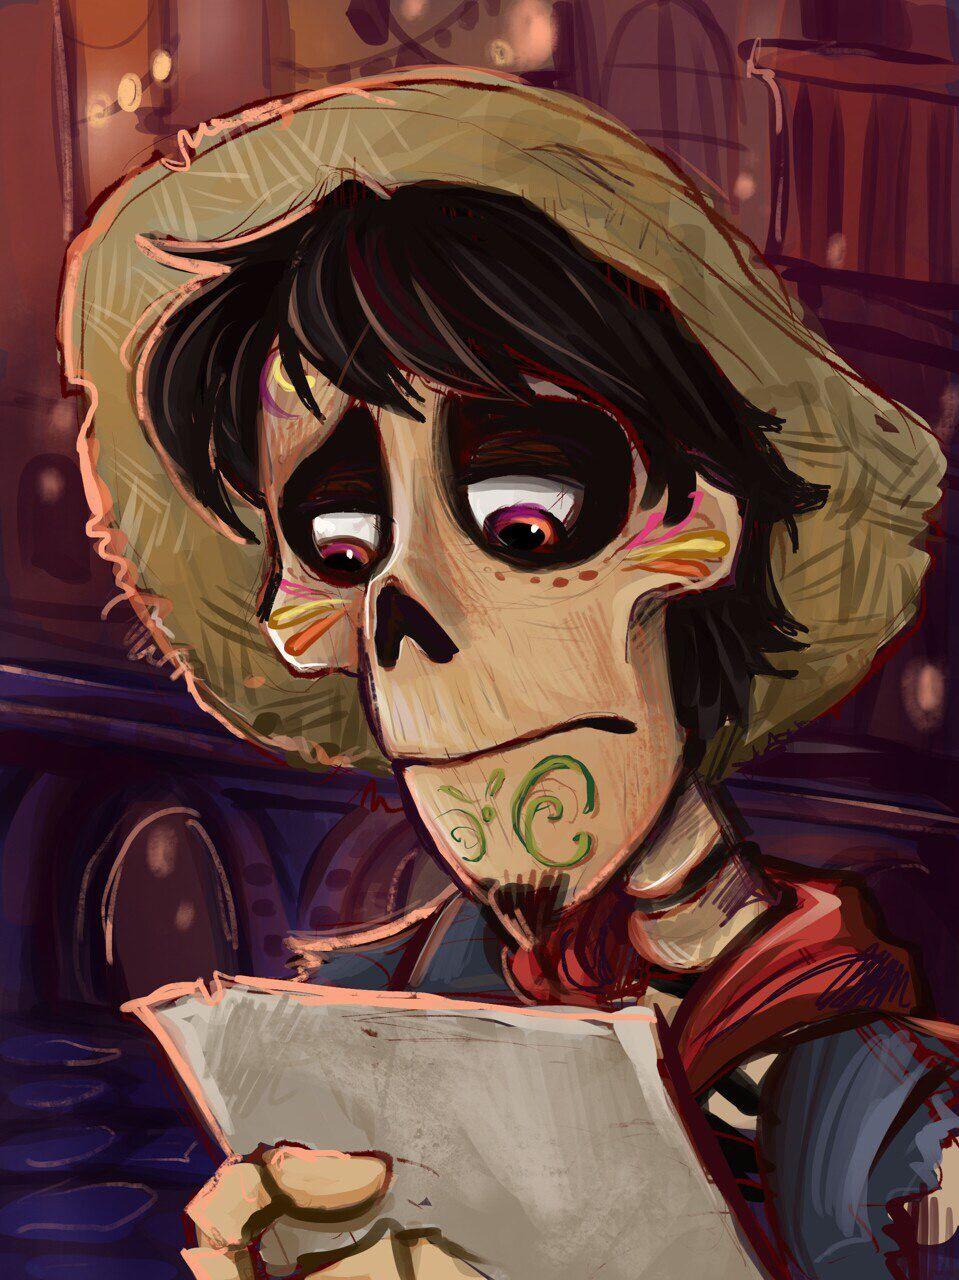 Hector in coco movie 2017 Disney Pinterest Movie